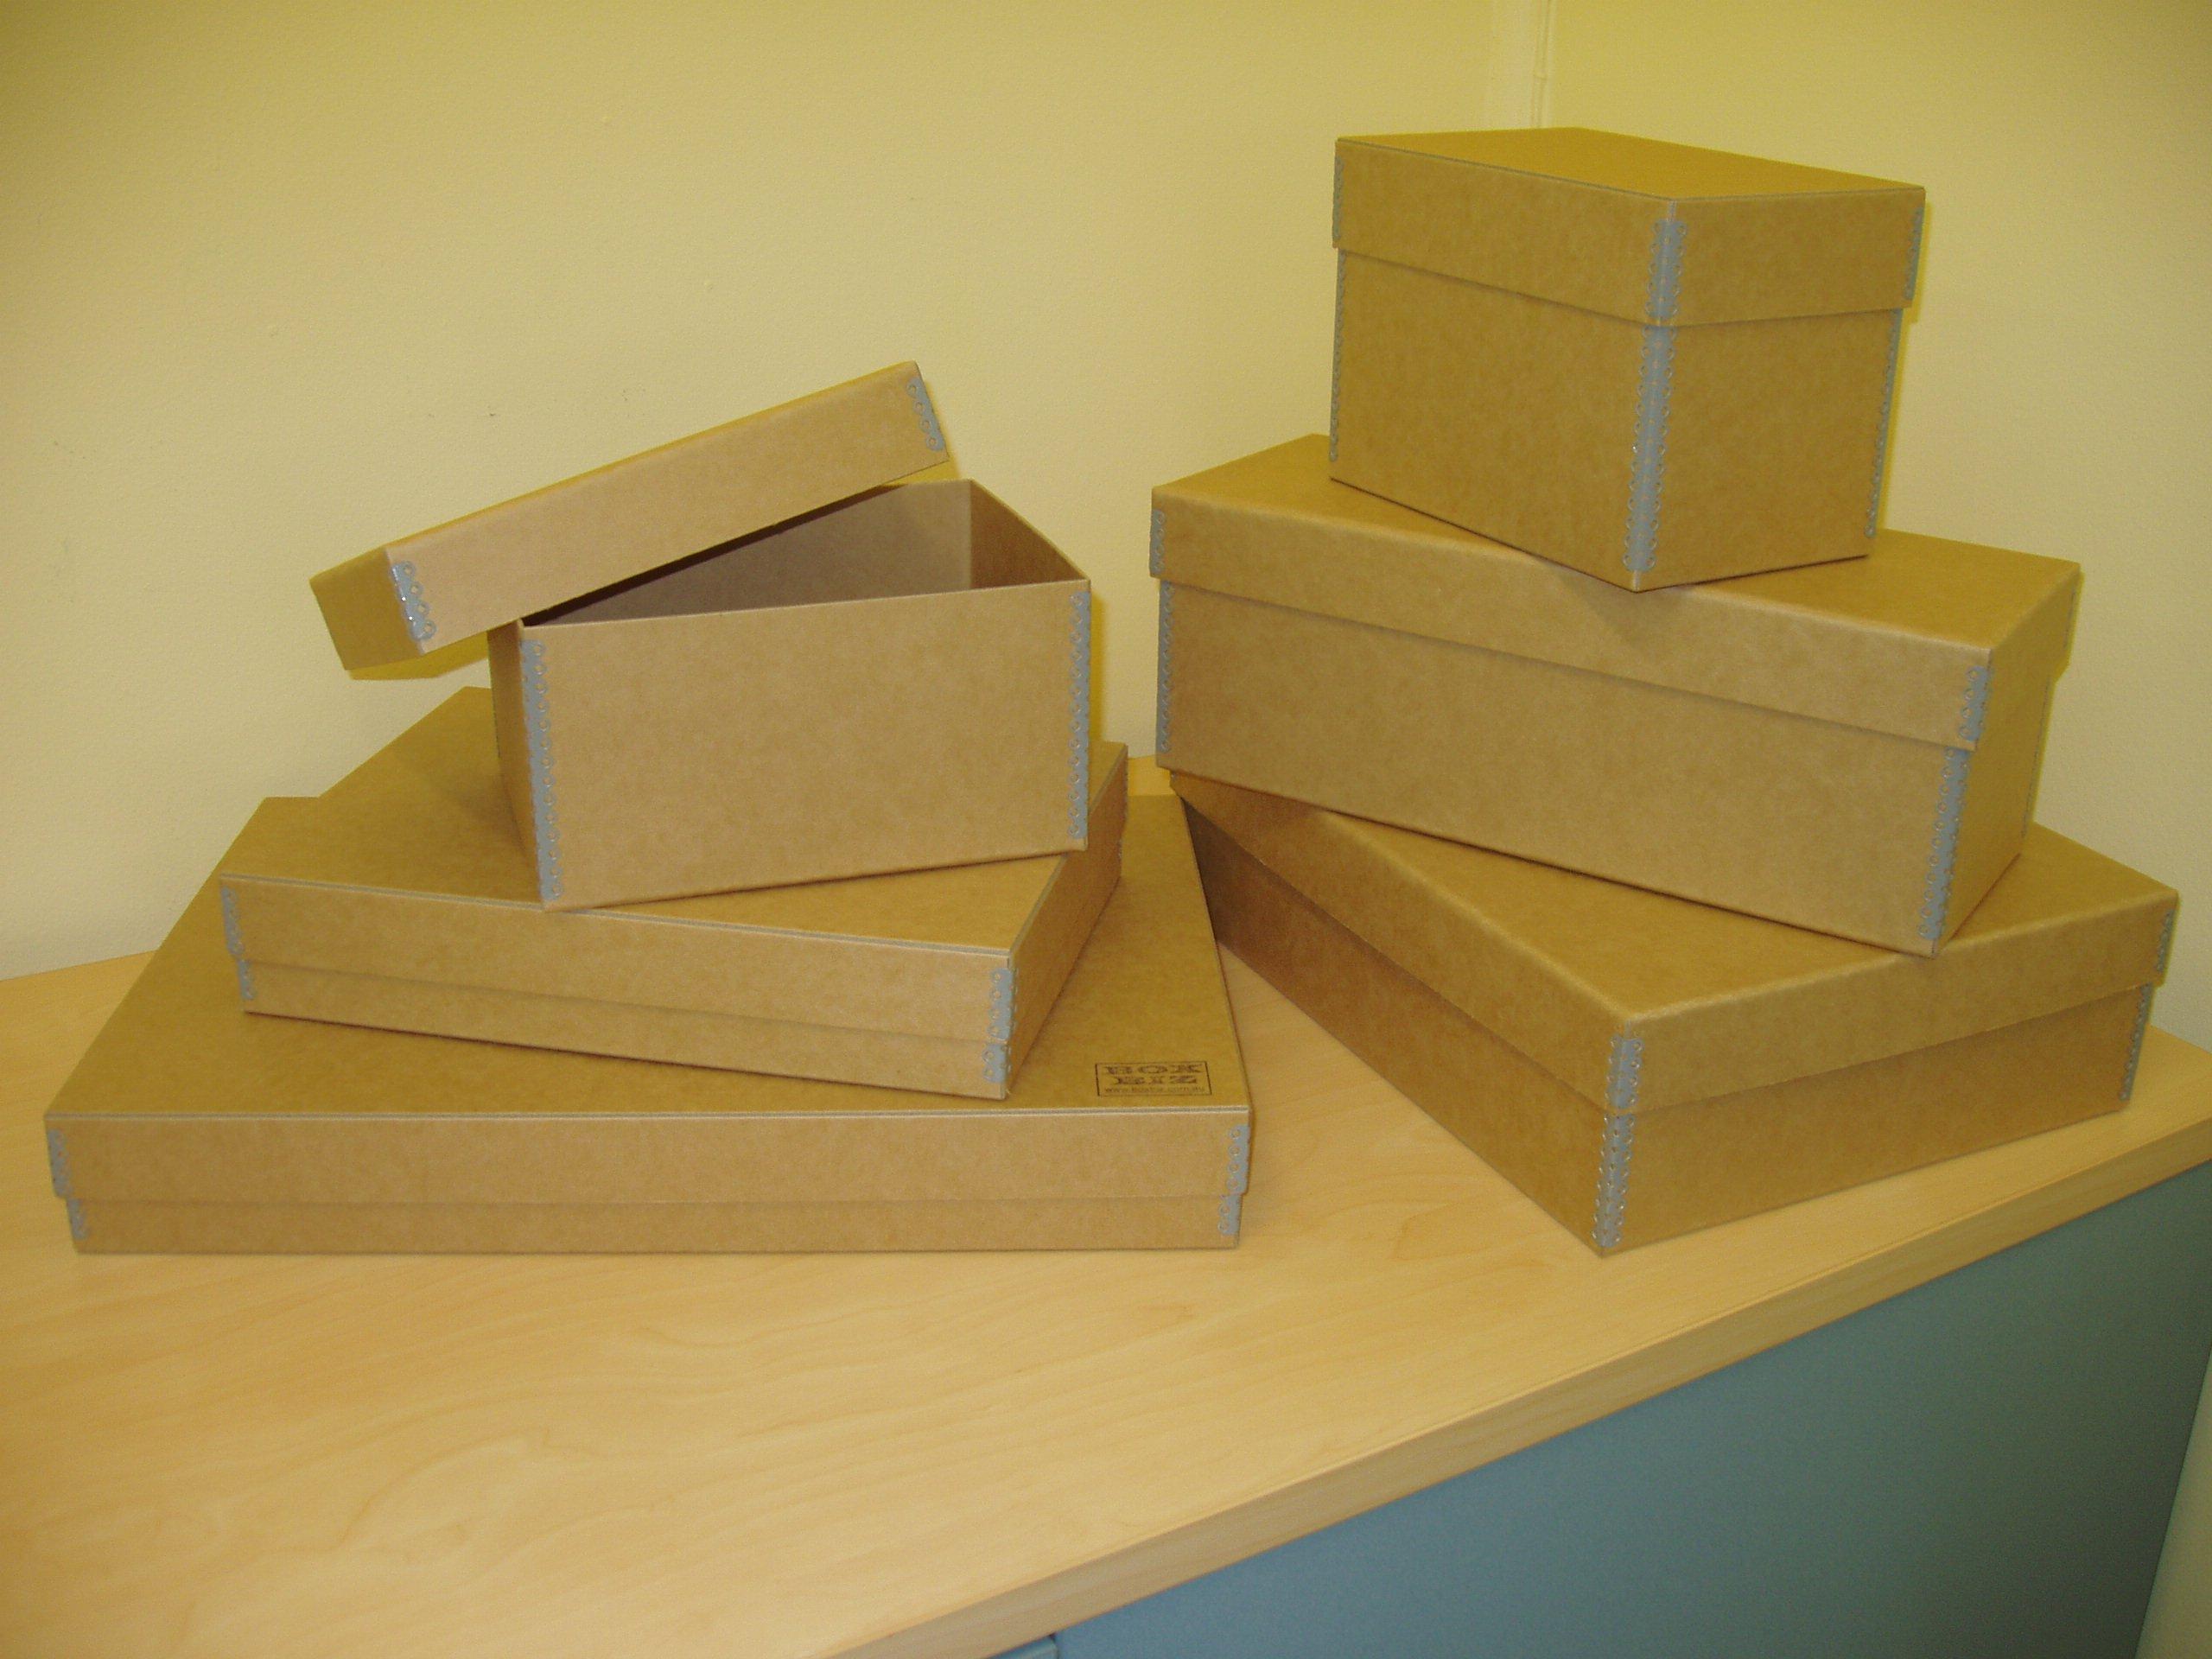 Metal Edge 'Fastay' boxes Jul06 001